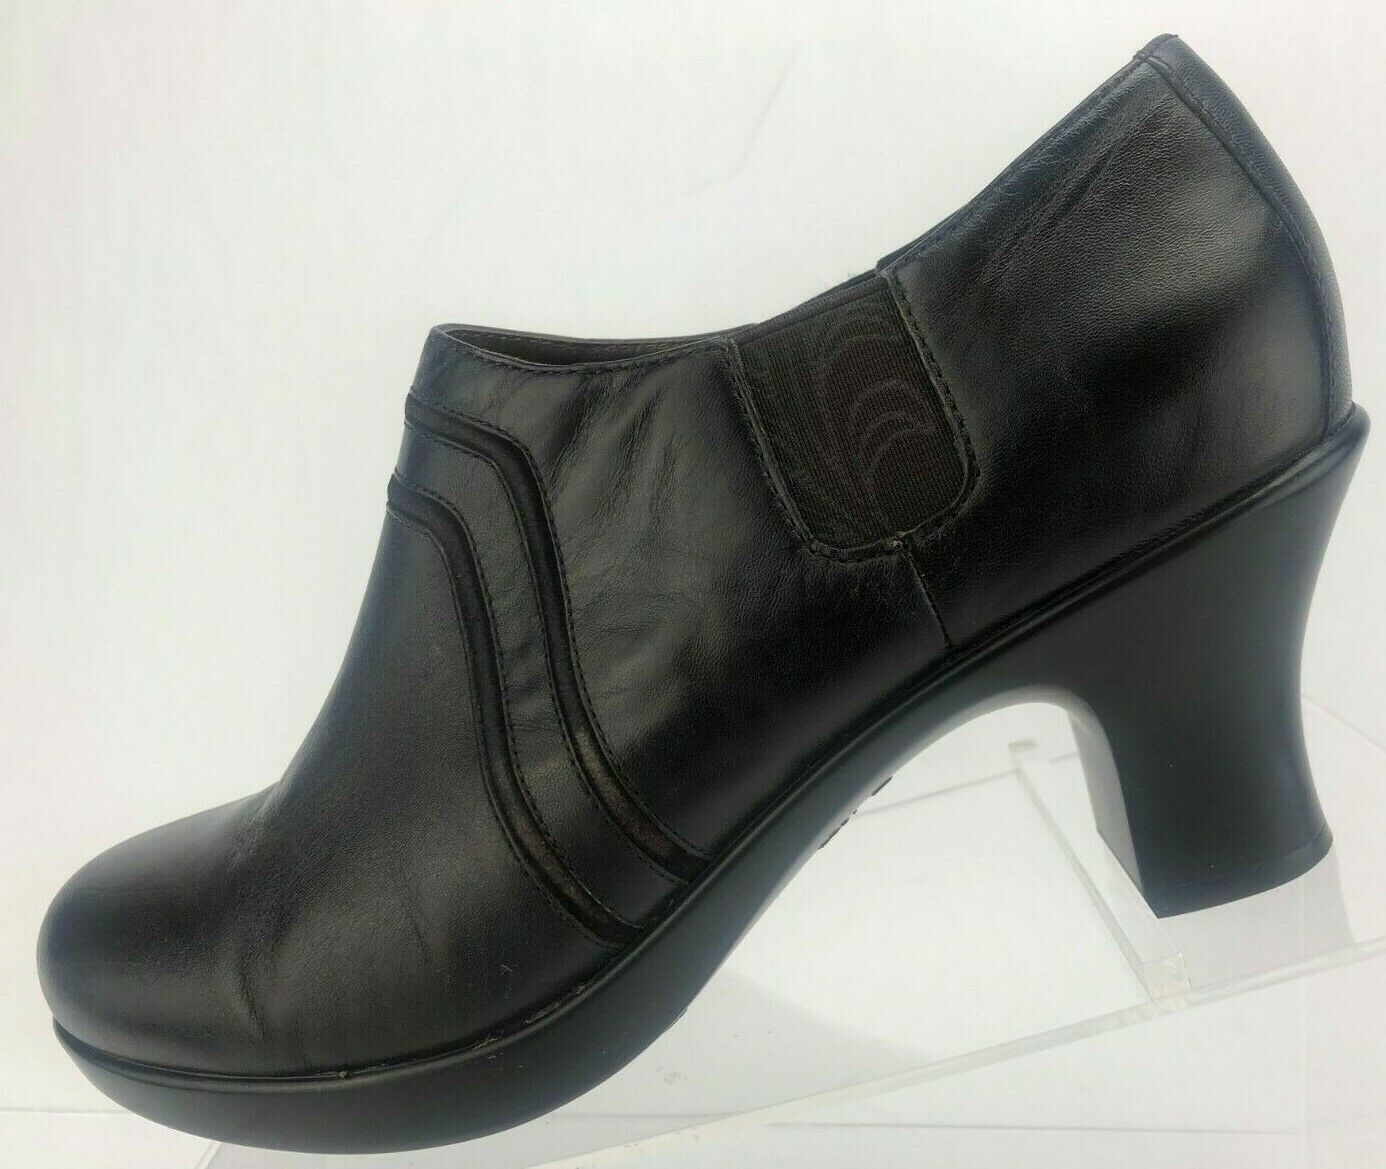 Dansko Heel Booties Banks Brown Leather Nappa Comfort Pumps Womens 39 8.5,9